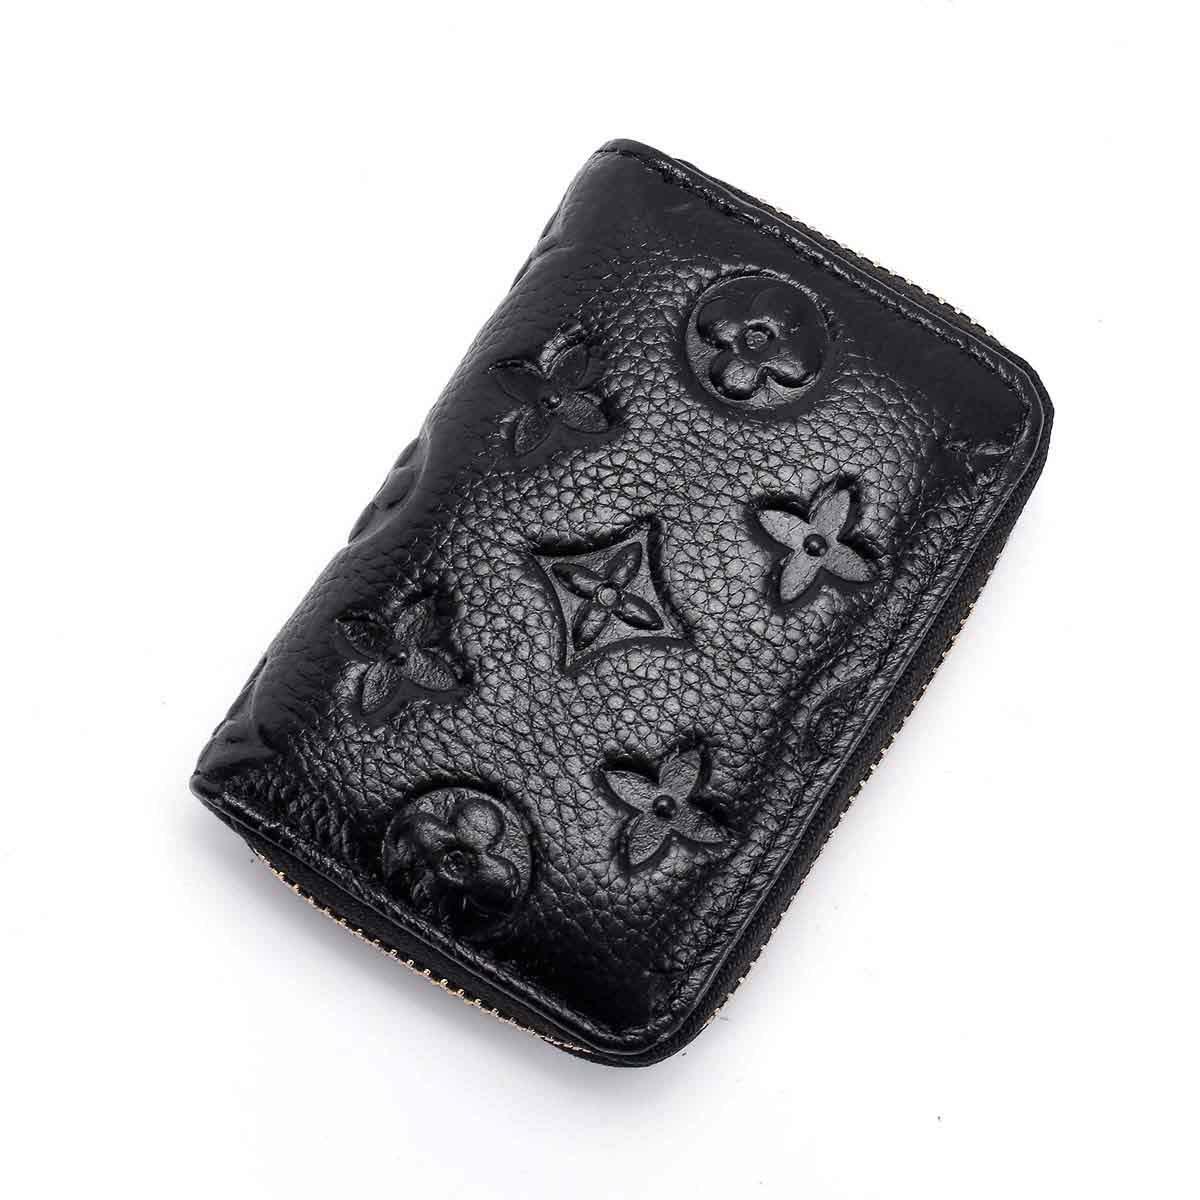 Auner Women RFID Blocking Credit Card Holder Leather Cute Small Zipper Wallet - Black by Auner